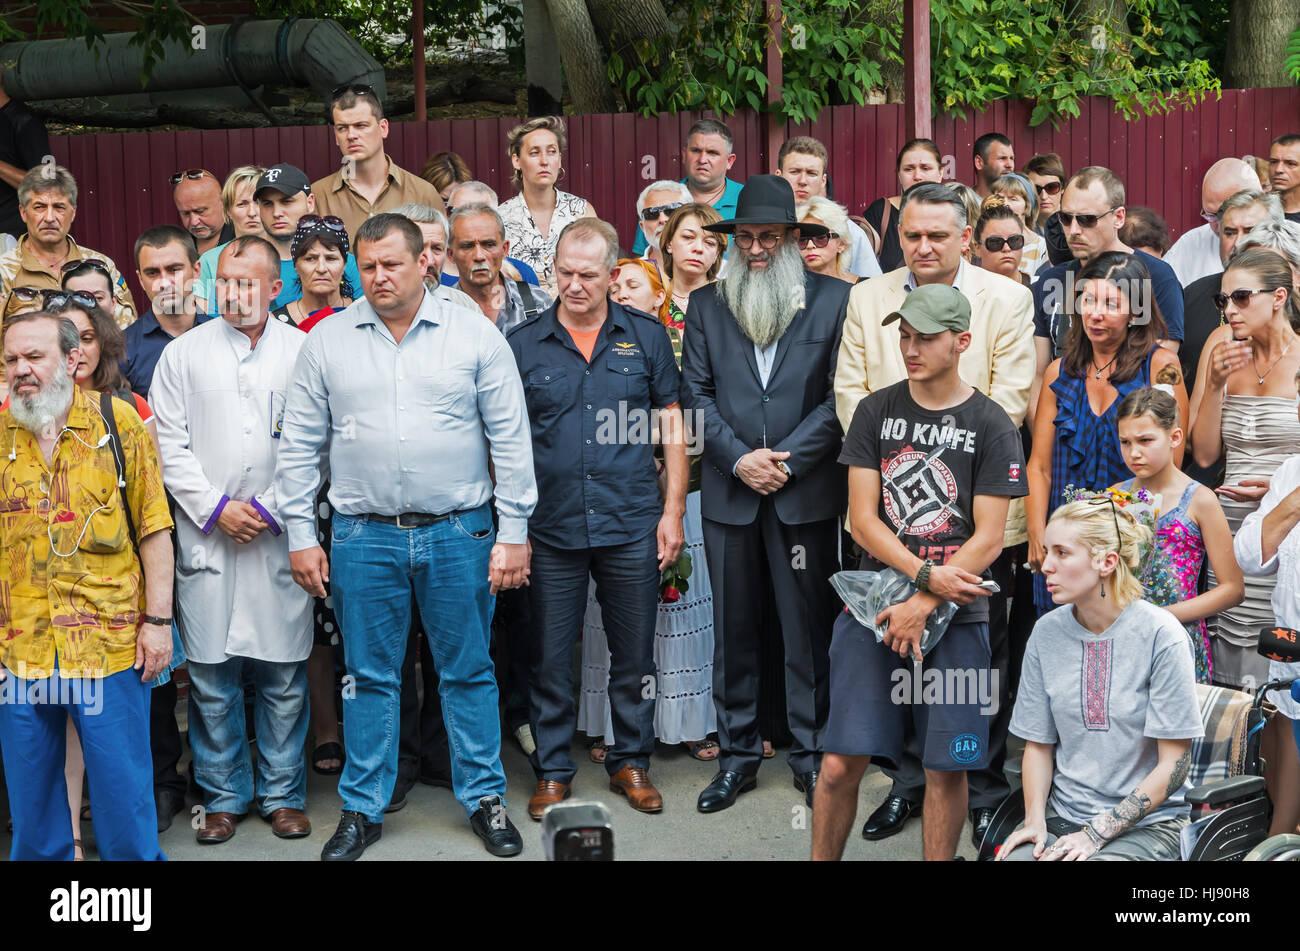 Dnepropetrovsk, Ukraine - June 30, 2016: Near the morgue building people say goodbye to Ukrainian baritone singer - Stock Image